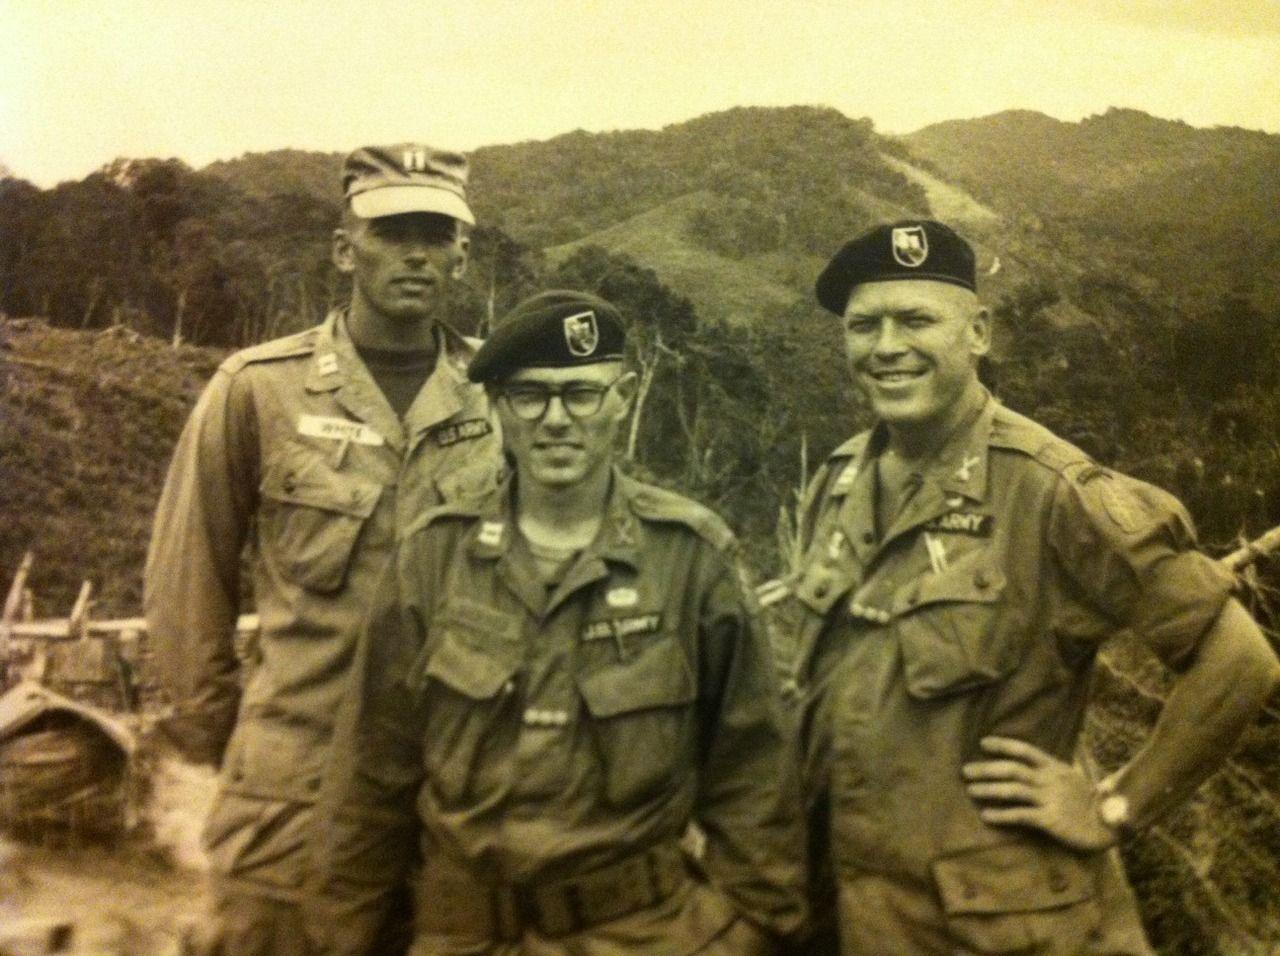 5th Special Forces Group At Dak Pek 1965 Vietnam War Green